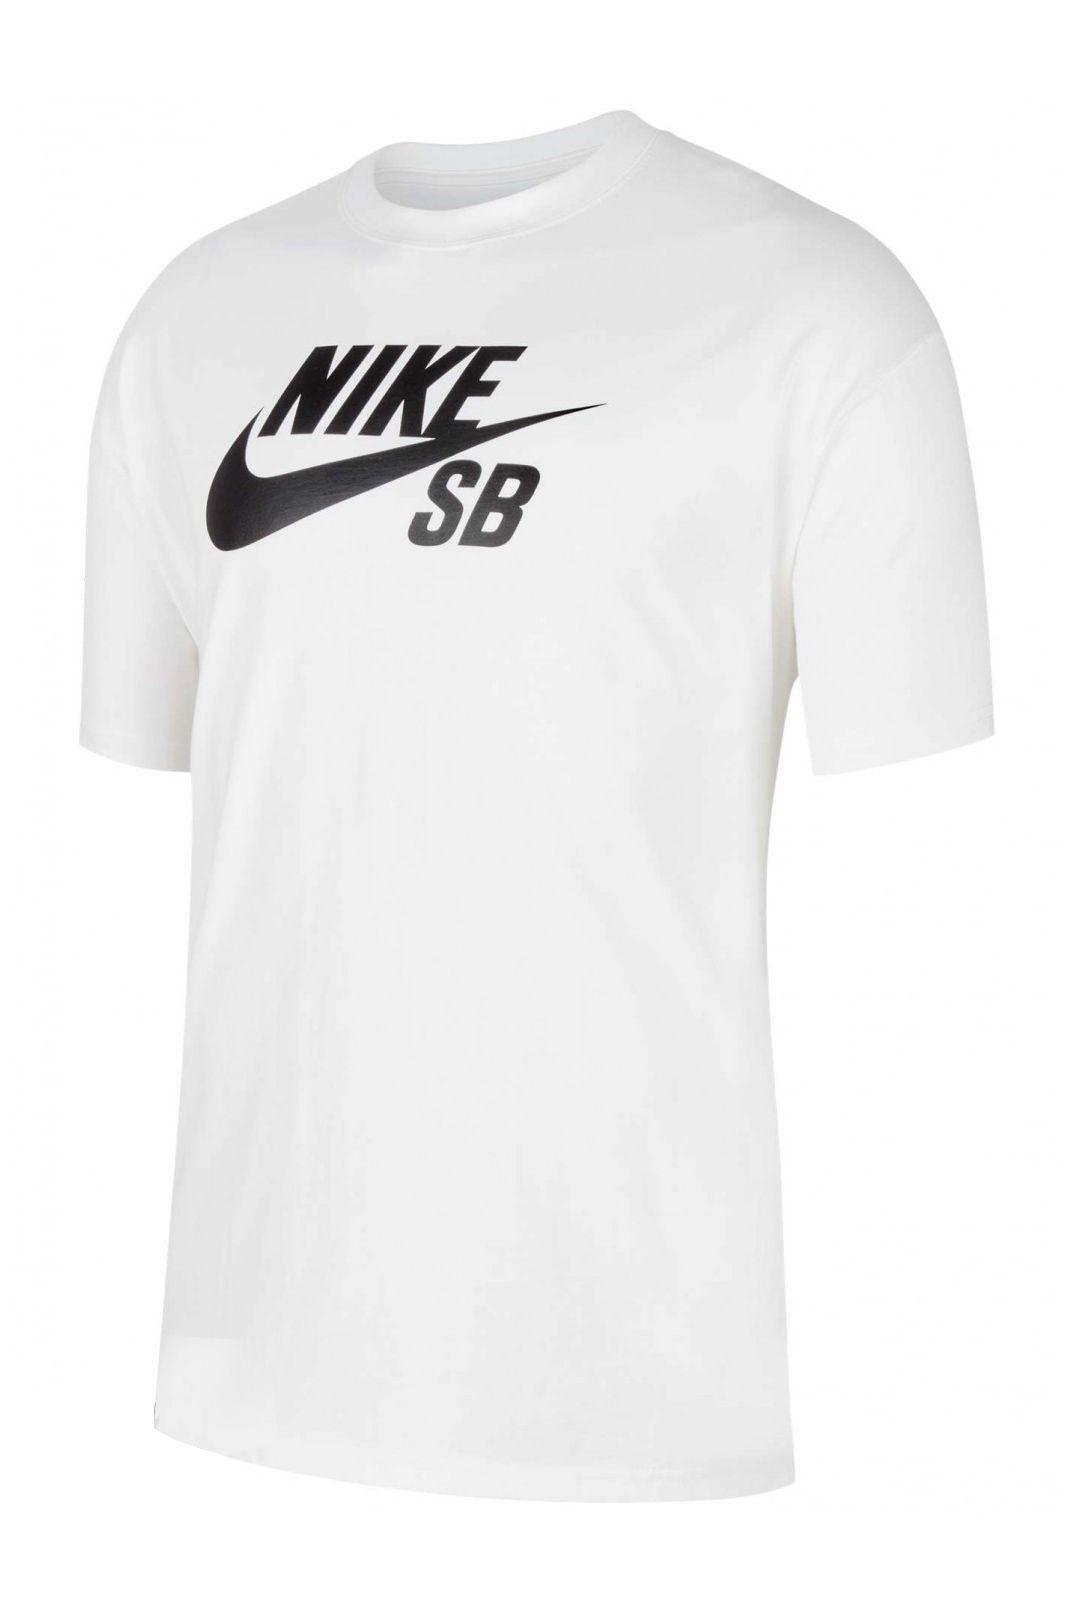 Nike Sb T-Shirt LOGO White/(Black)